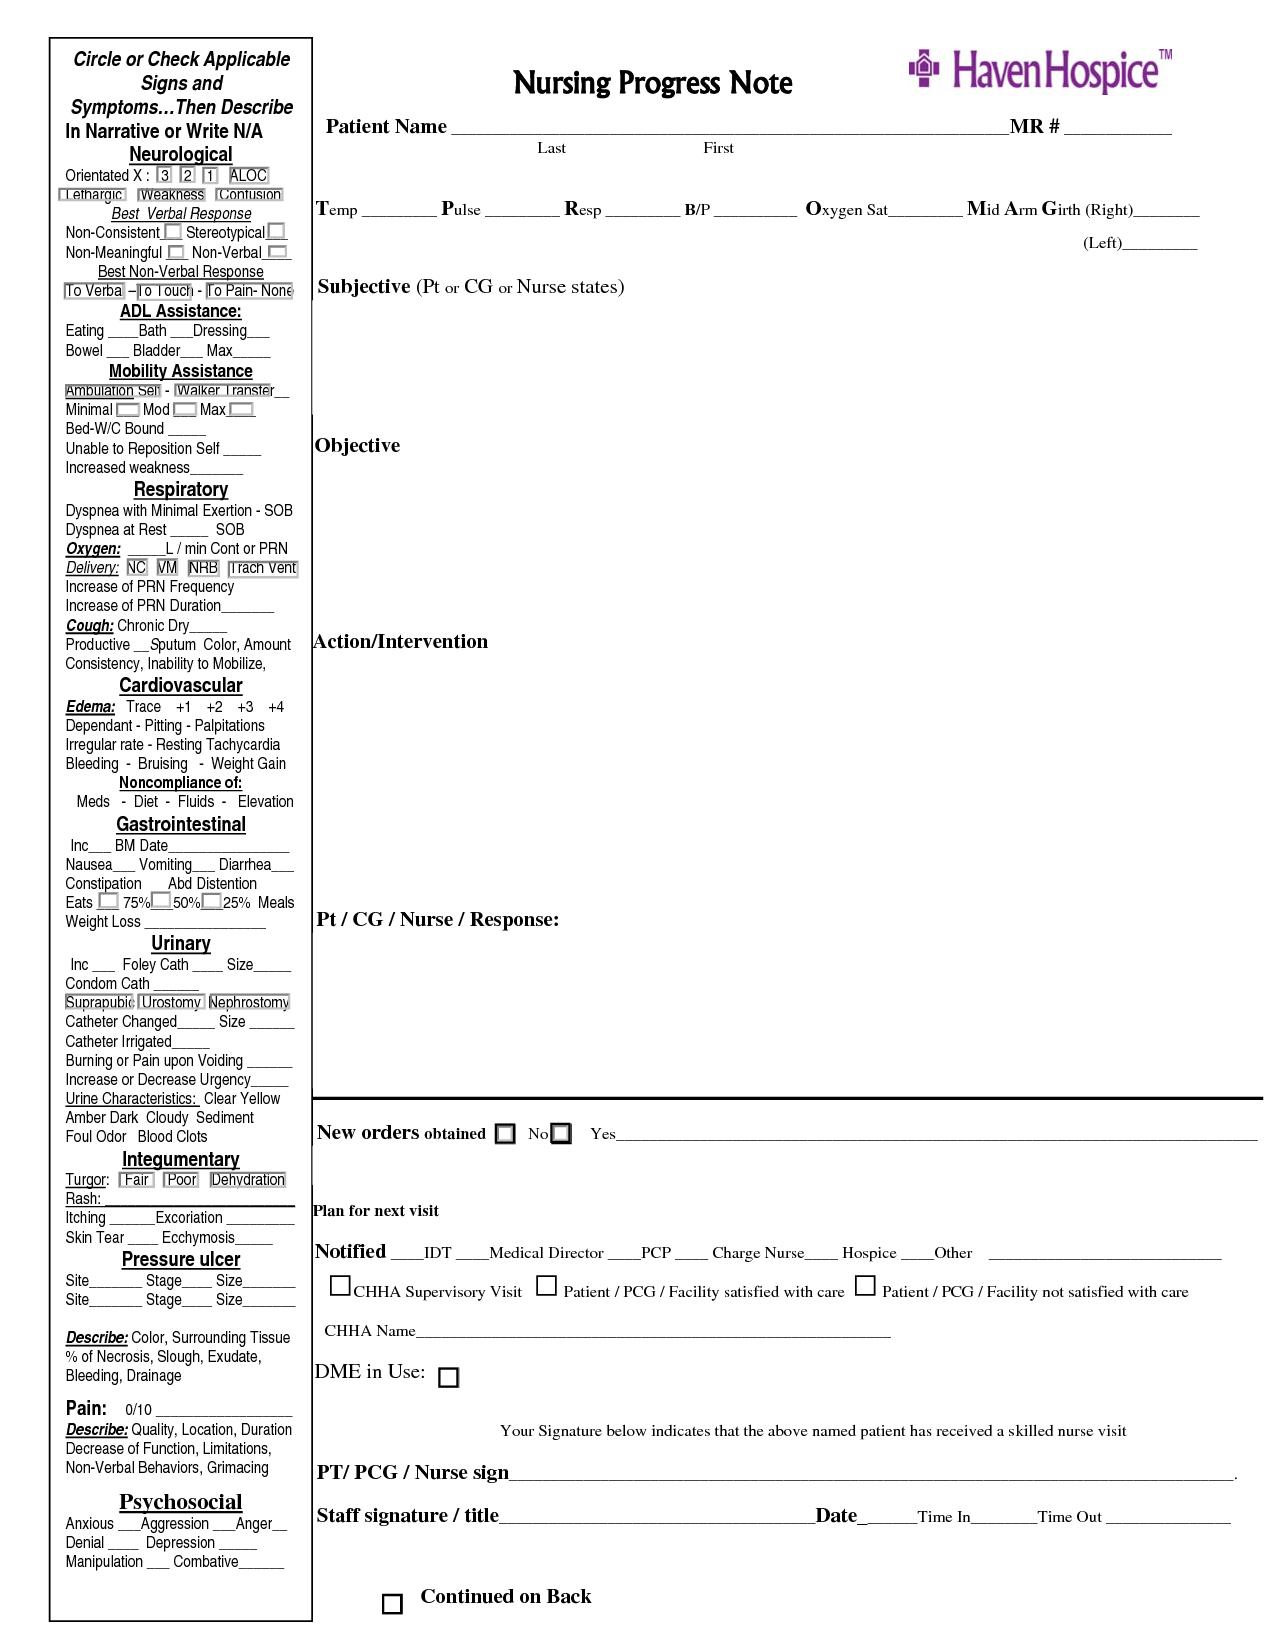 nursing notes | Nursing Progress Note | Documentation | Pinterest ...